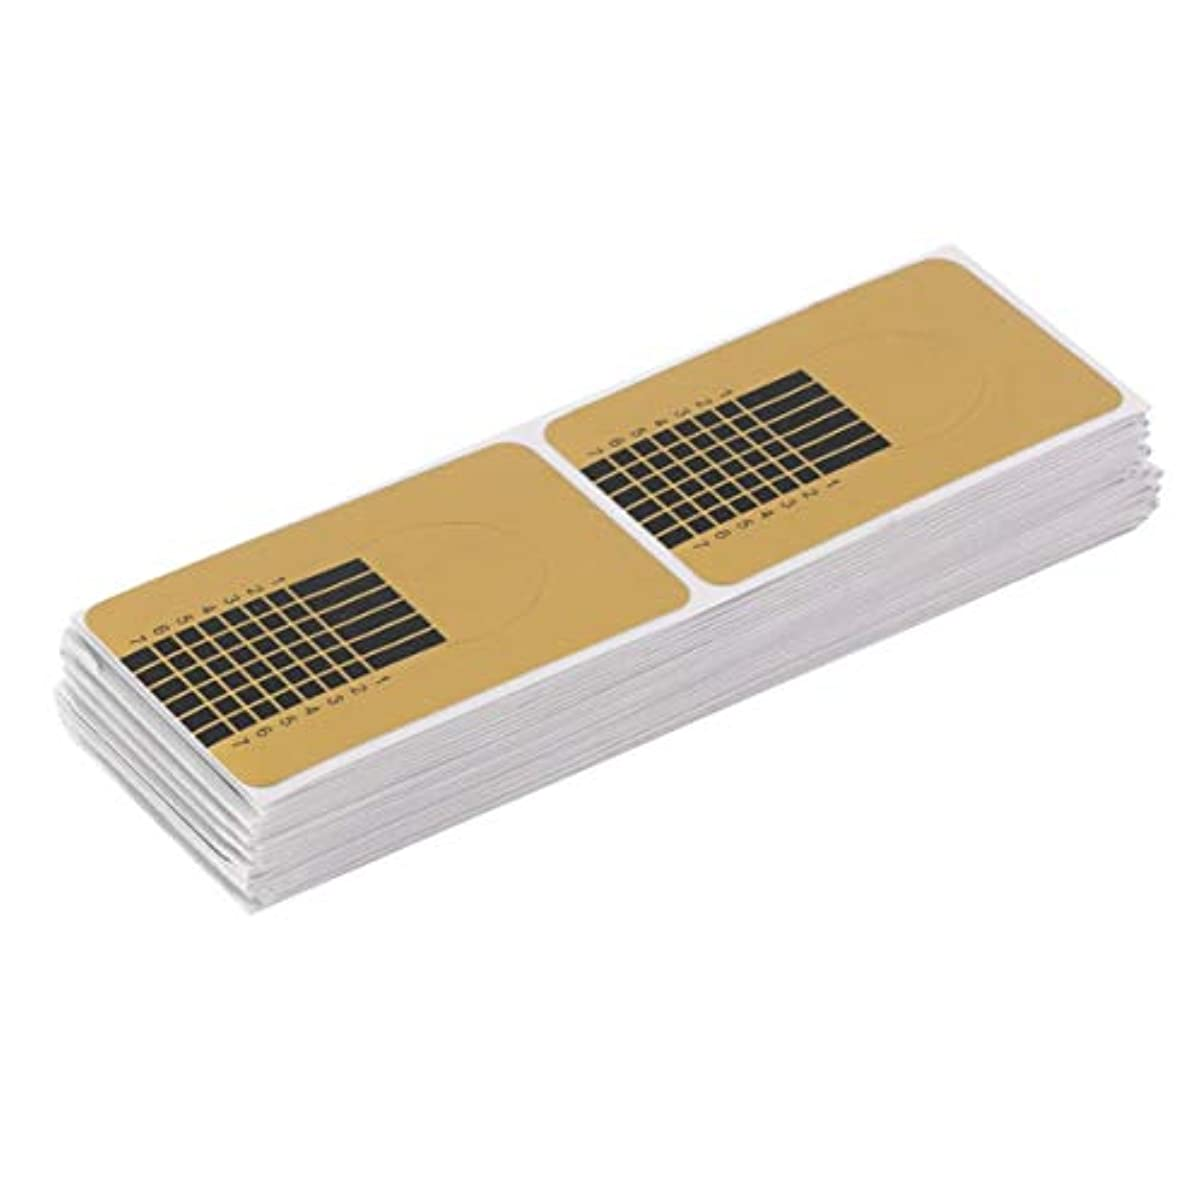 Birdlantern 100ピース/セットプロフェッショナルネイルツールのヒントネイルアートガイドフォームアクリルチップジェルエクステンションステッカーネイルポリッシュカールフォームゴールド